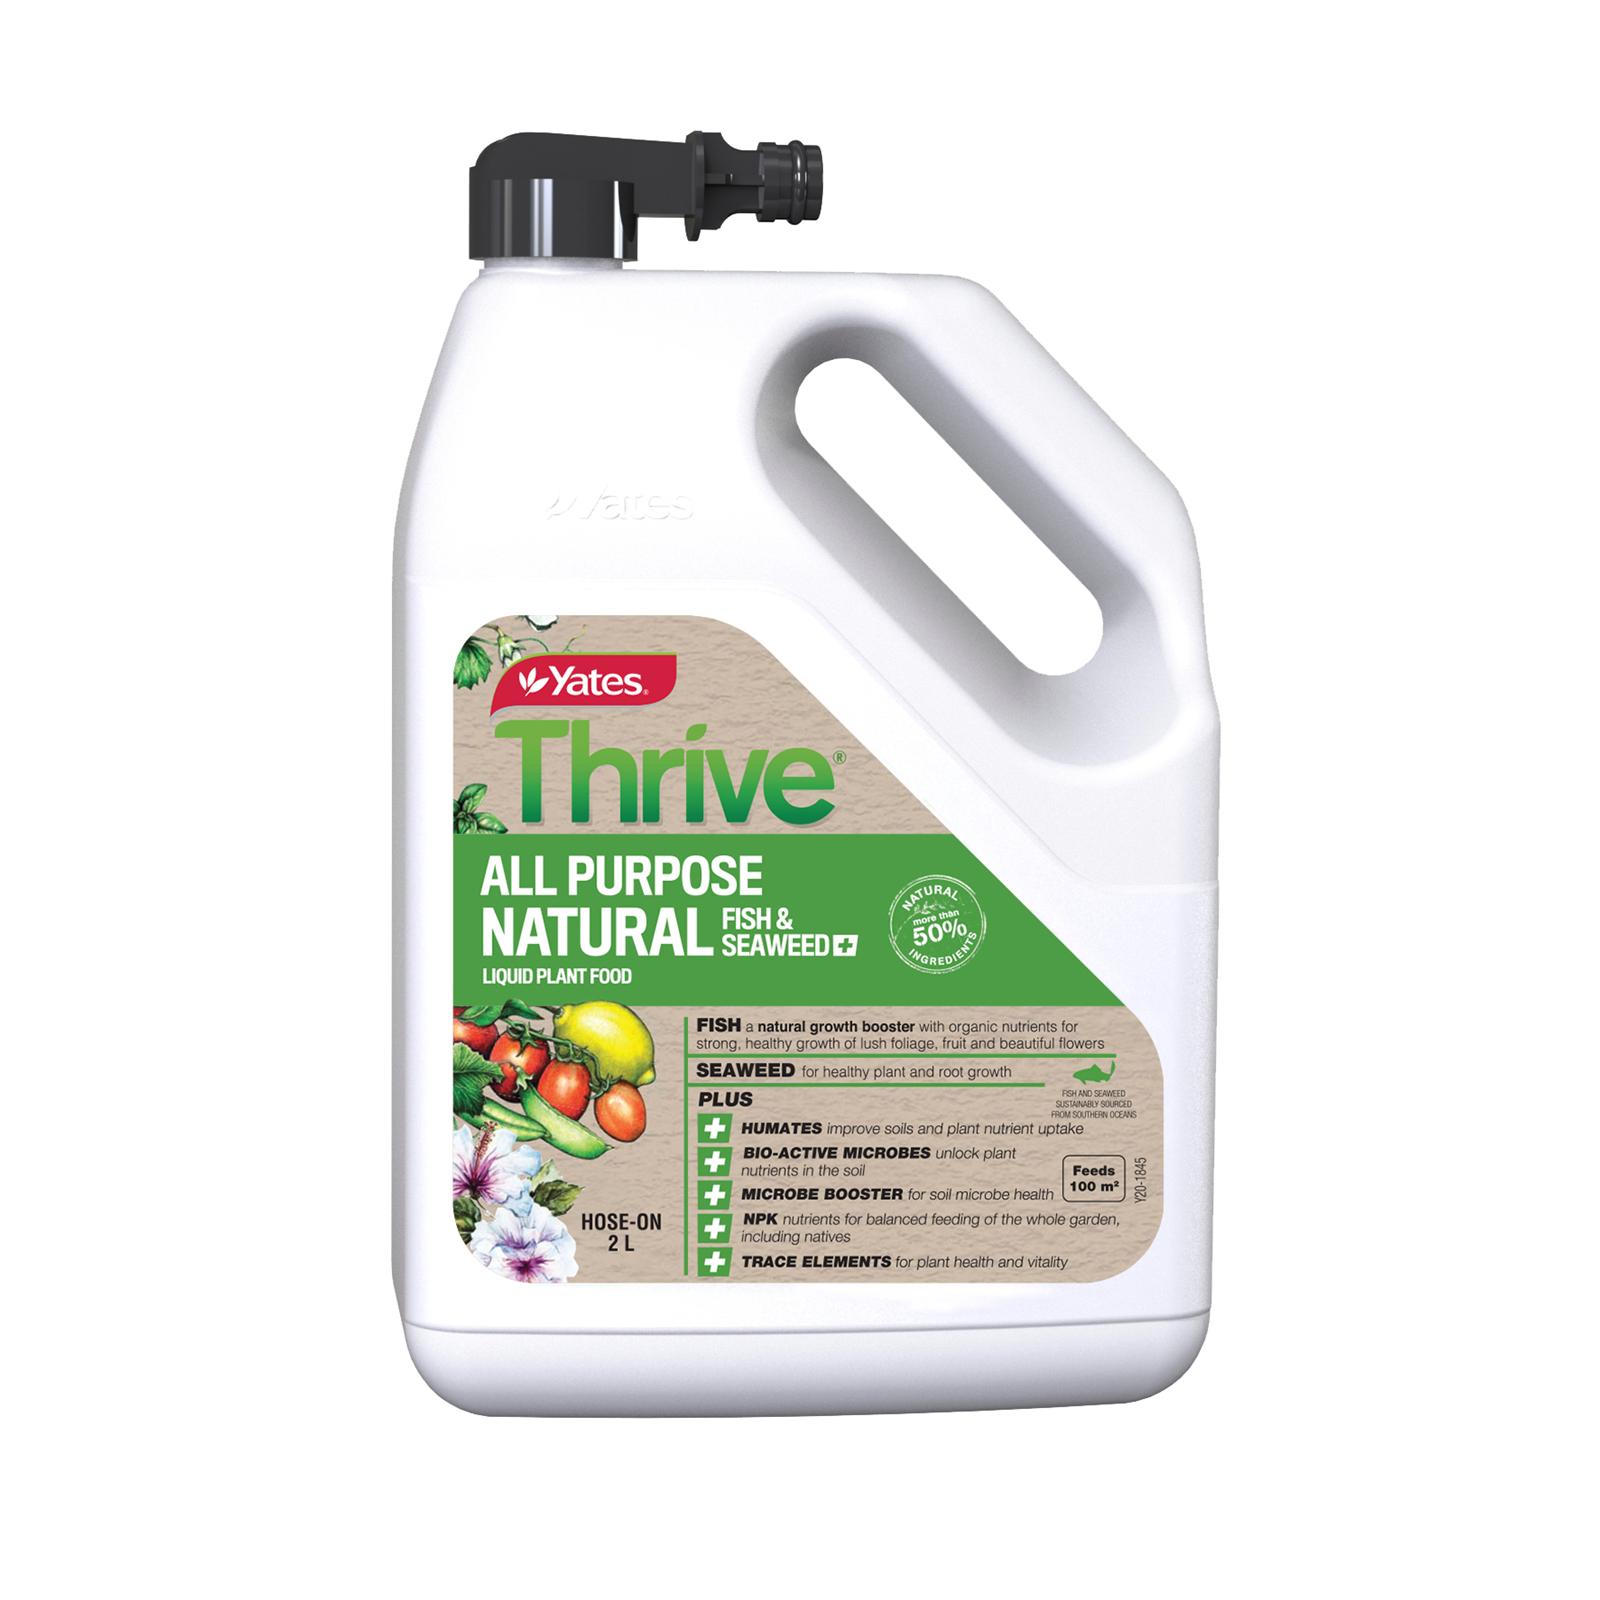 Yates 2L Thrive Natural All Purpose Hose On Liquid Plant Food